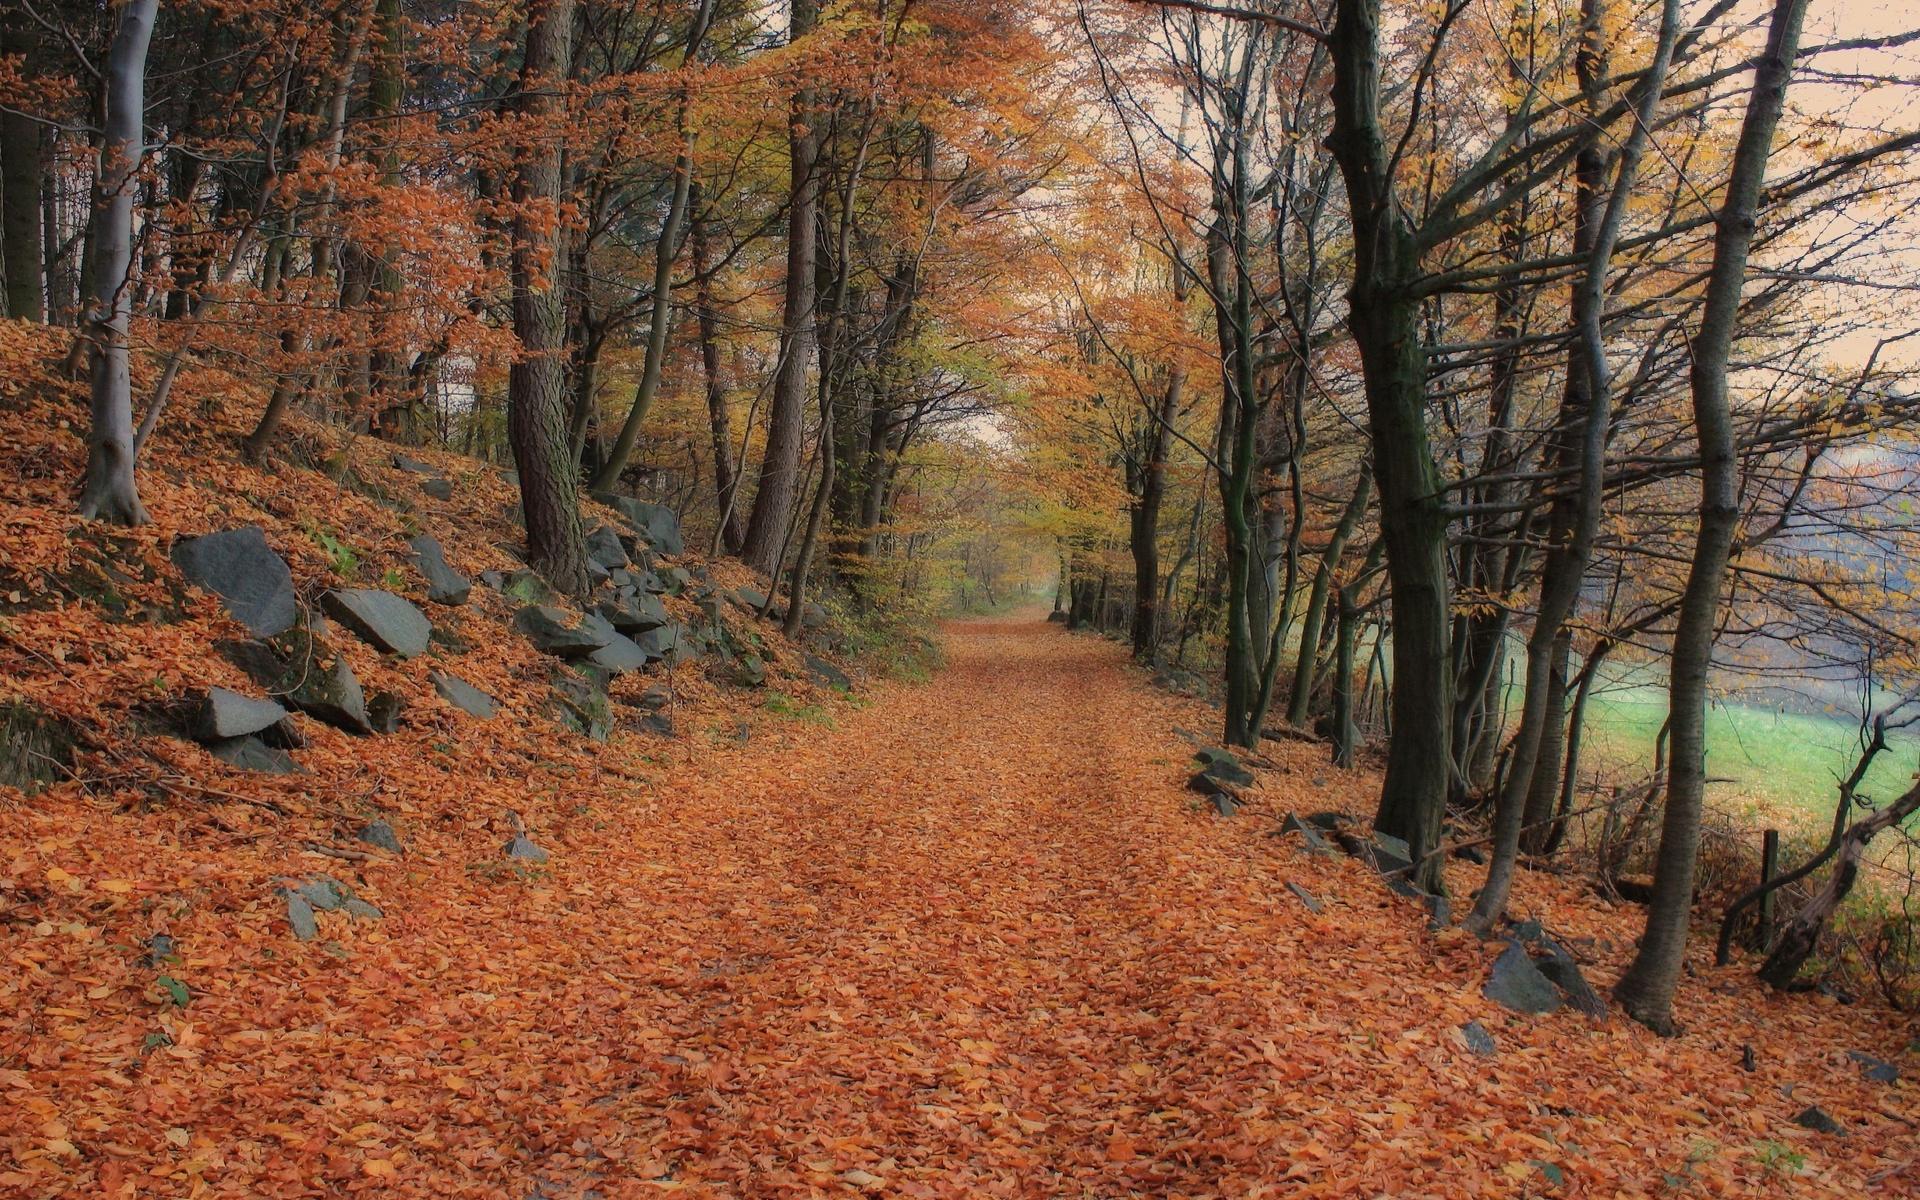 лес, тропинка, листья